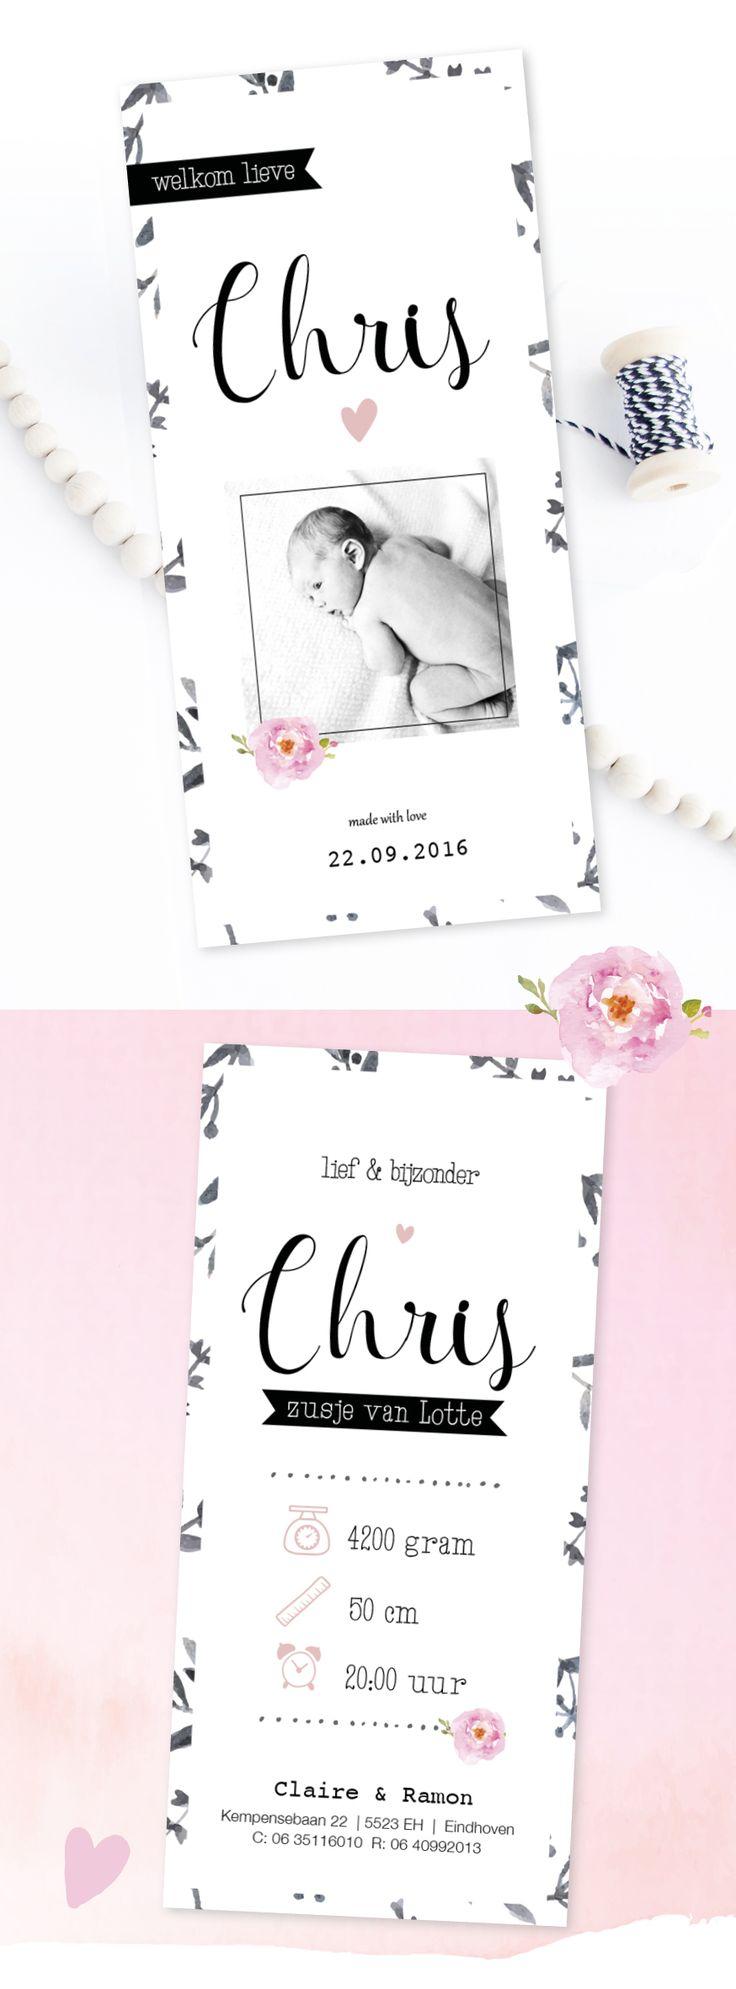 Lief geboortekaartje meisje met foto   ontwerp   bloem   waterverf   watercolor background   roos   roze   zwart wit   icoontjes   www.charlyfine.nl